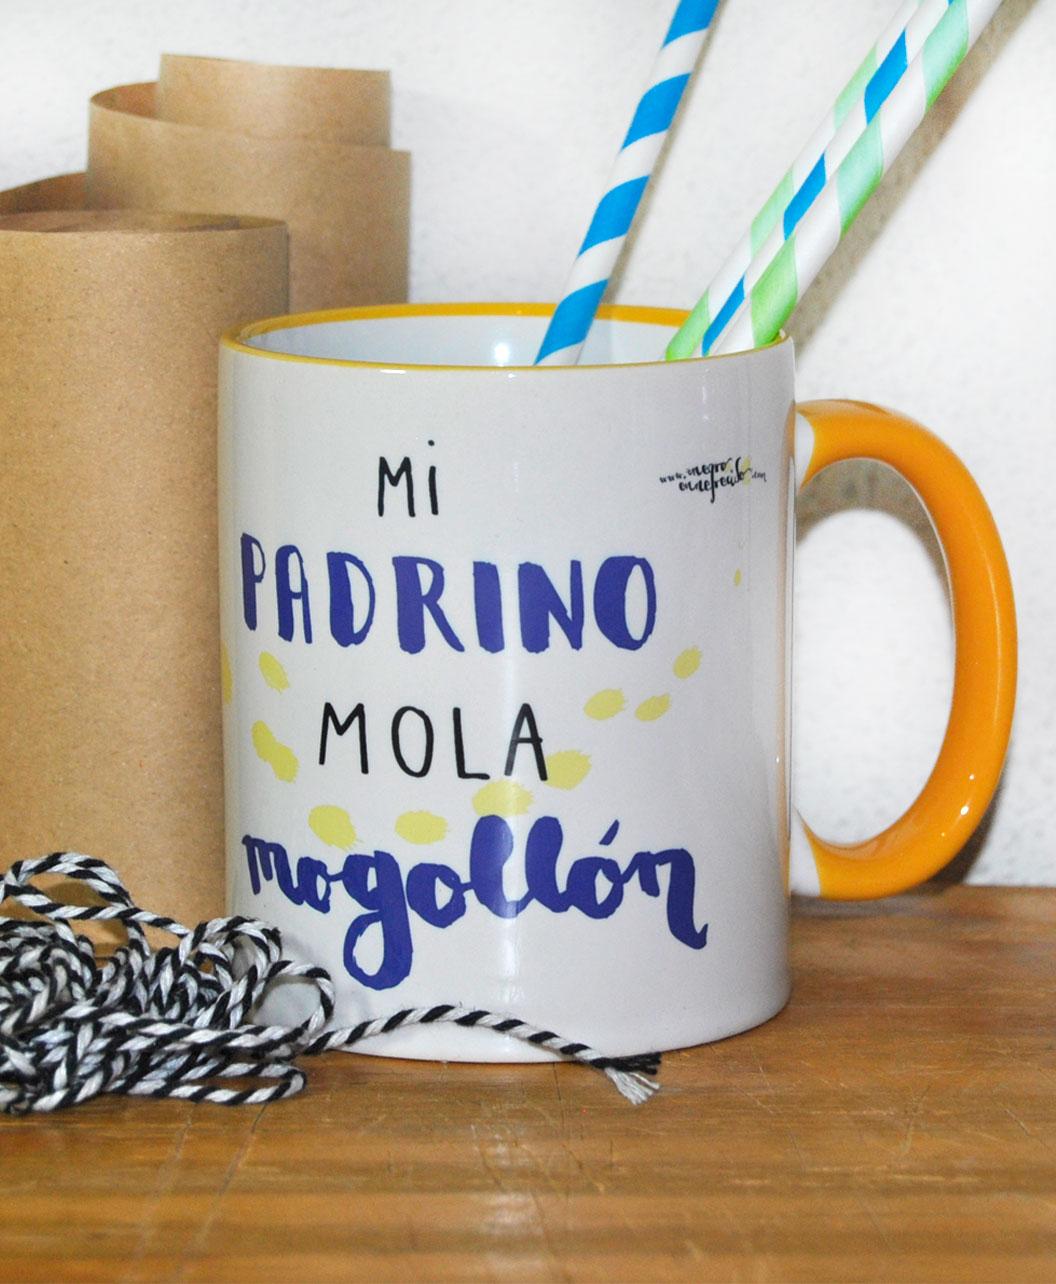 taza regalo padrino personalizada con foto y frase